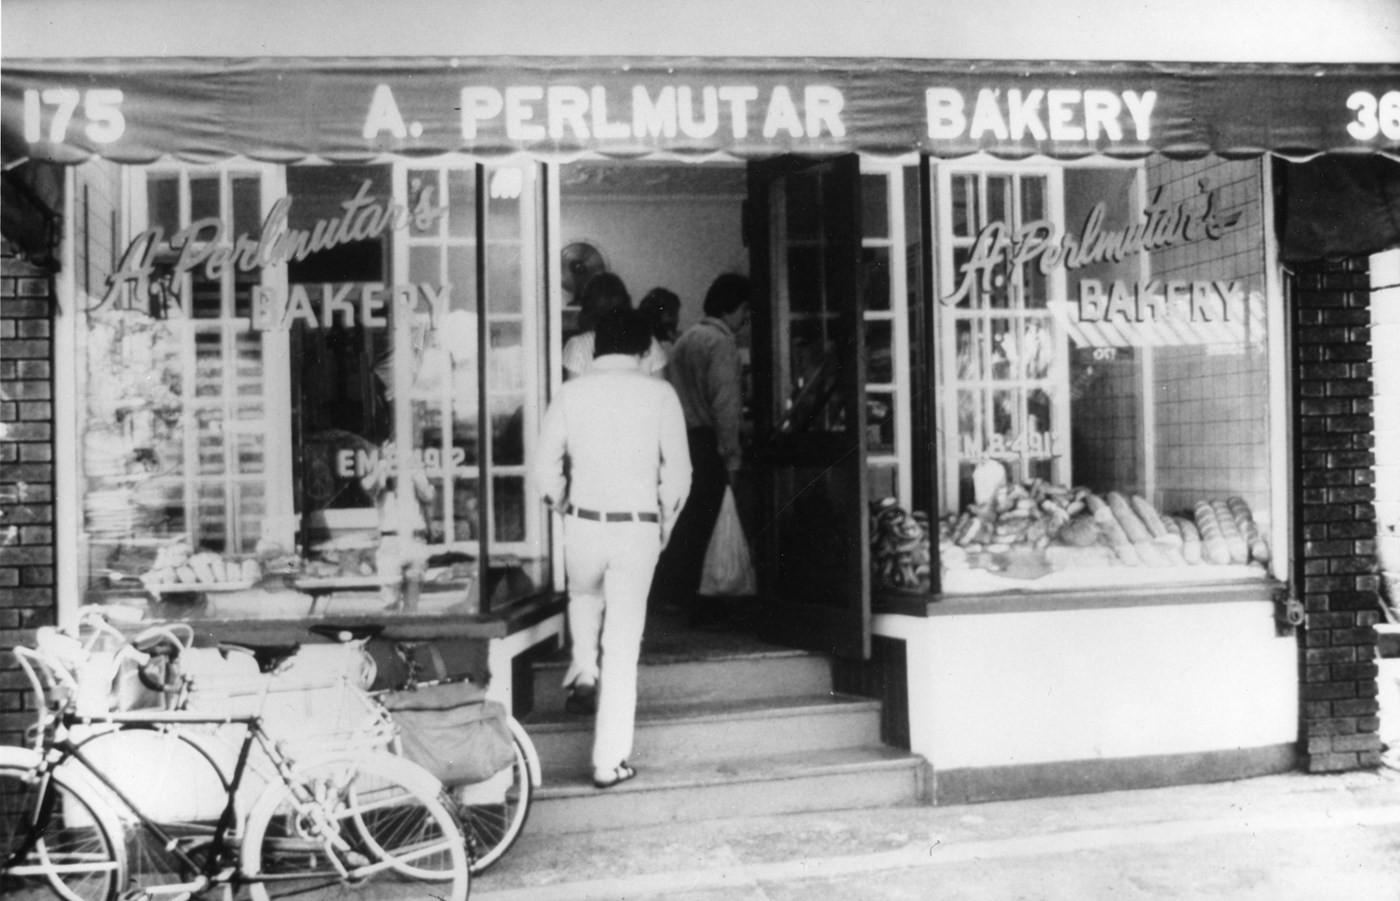 A. Perlmutar Bakery, 175 Baldwin Street, 1974. Photograph by Syd Shoub. OJA accession, 2012-10-11.